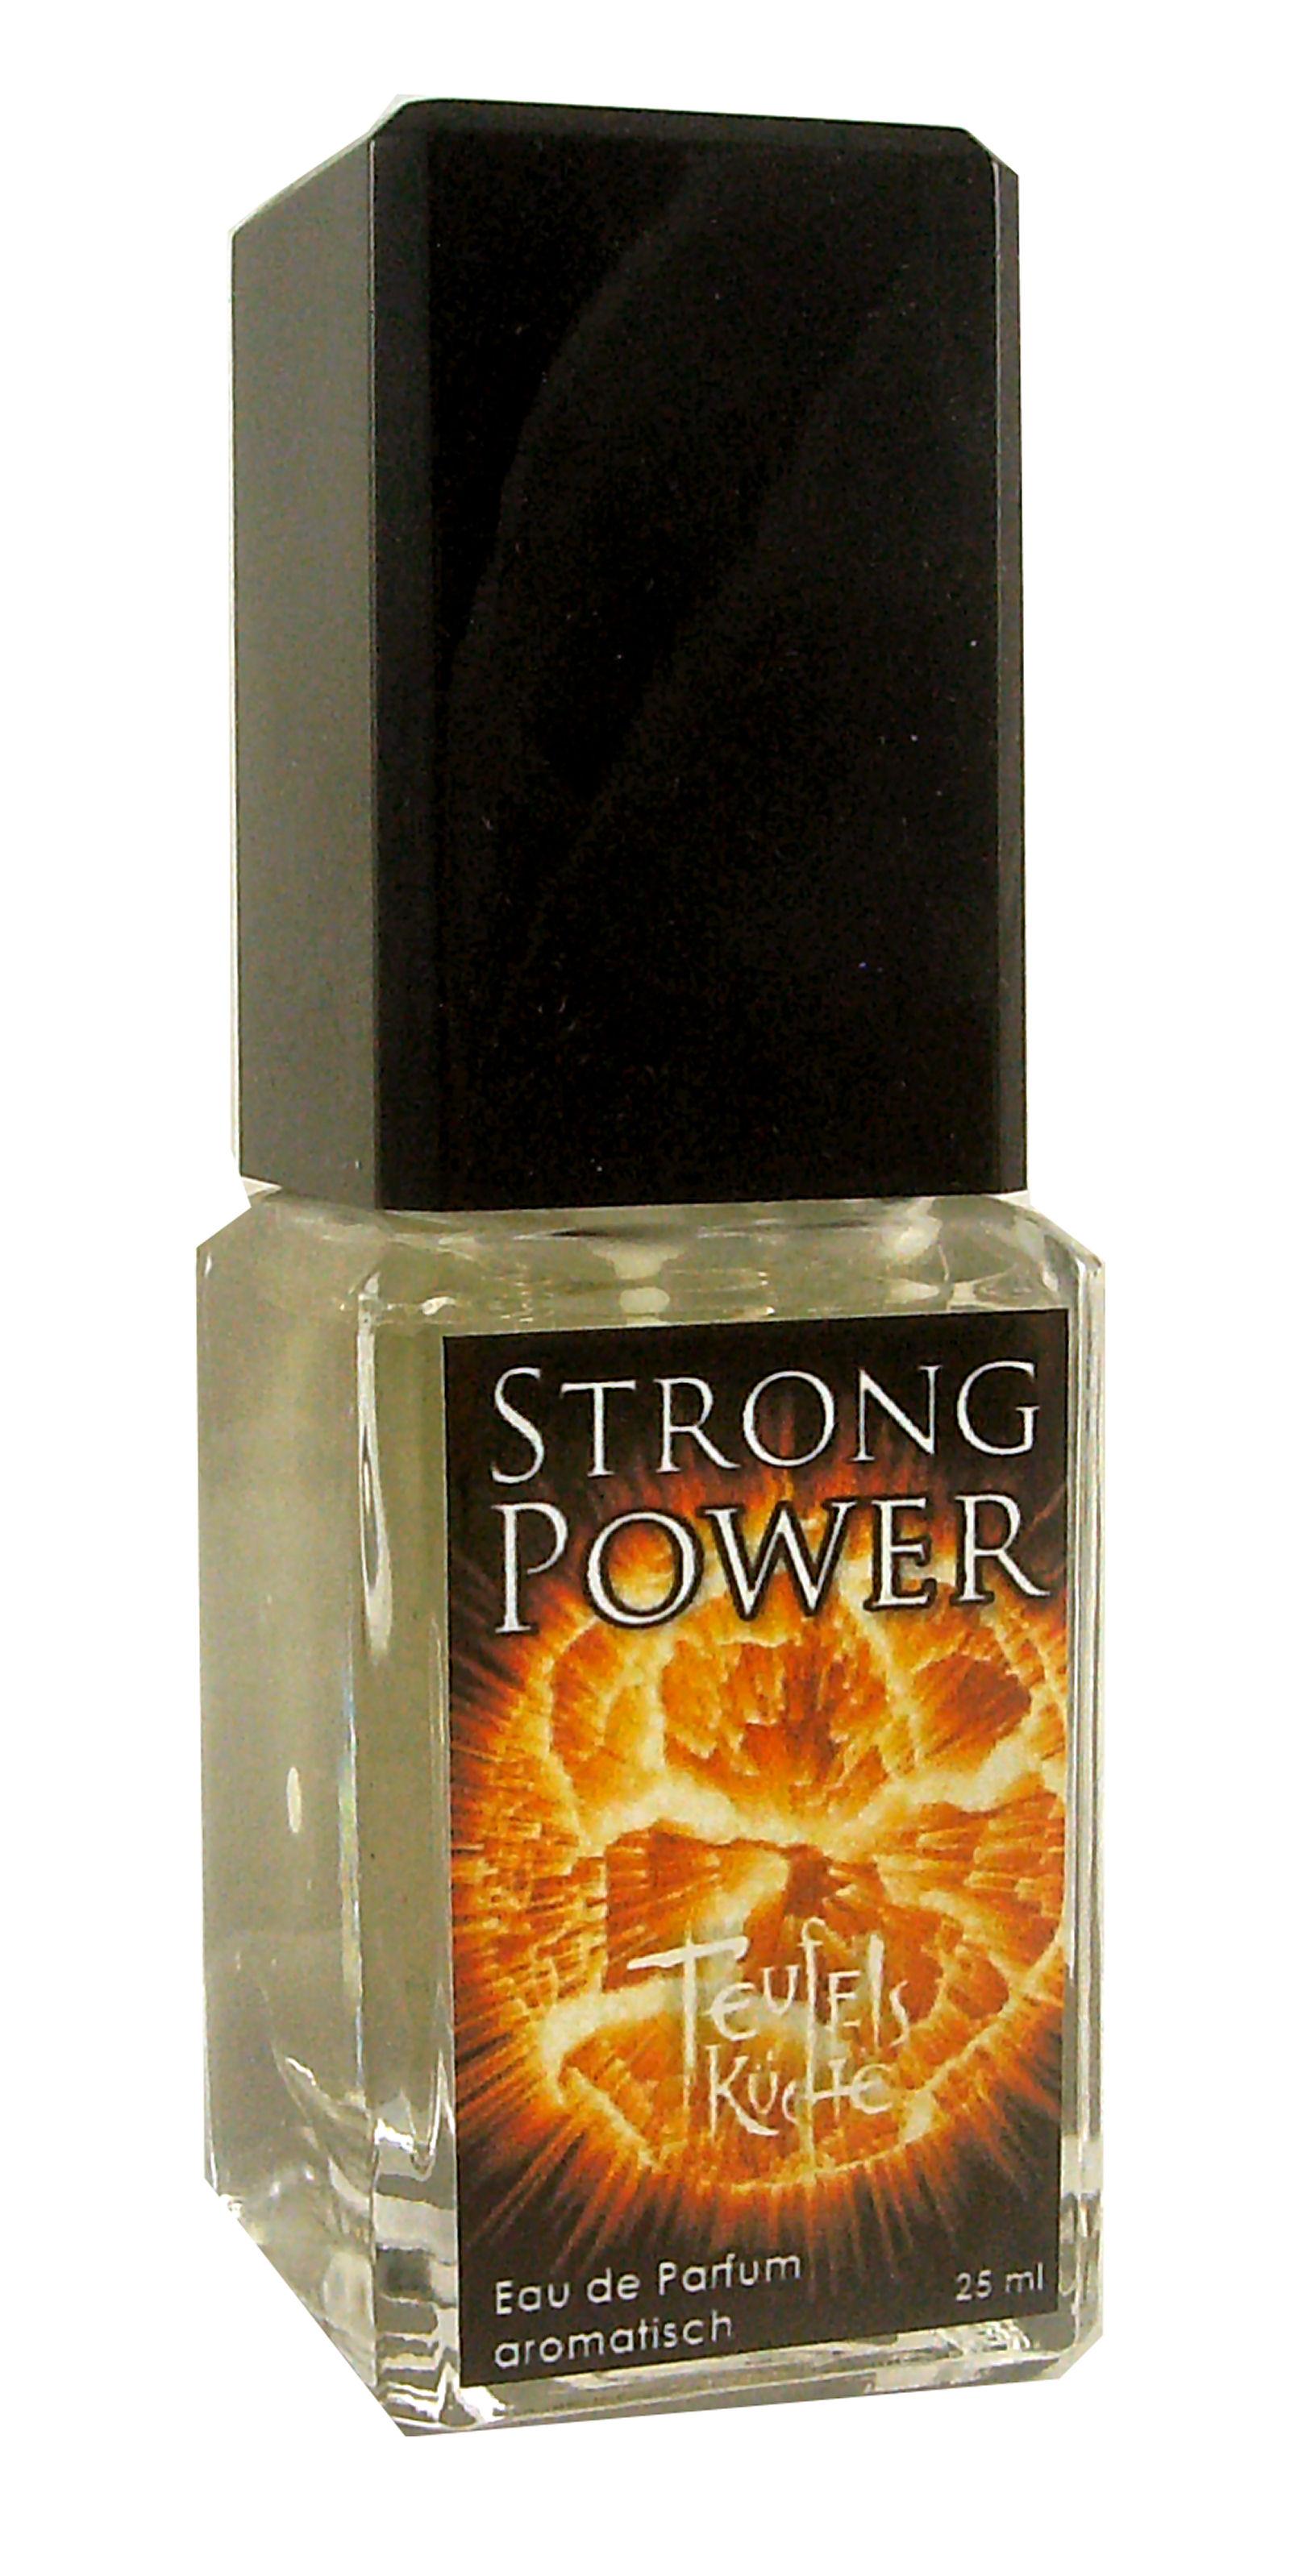 Eau de Parfüm, Strong Power, 25 ml